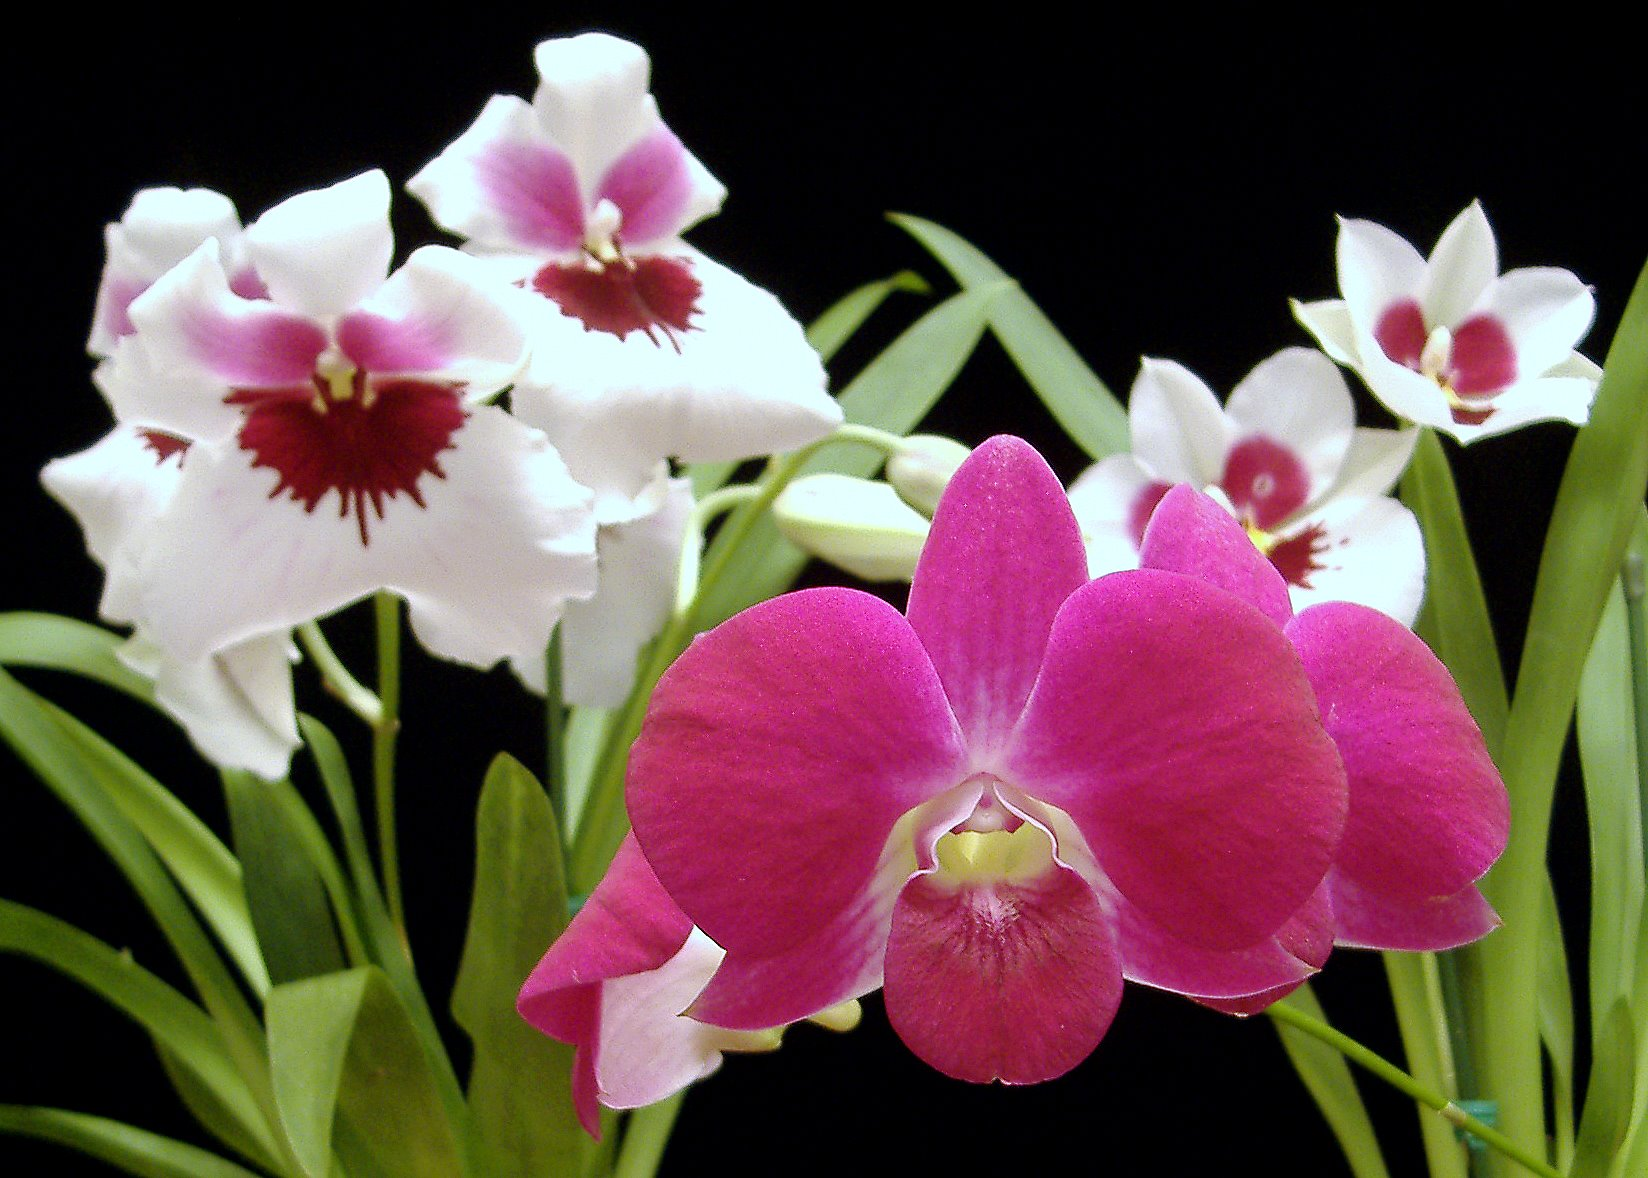 Elegant Mother's Day blooms